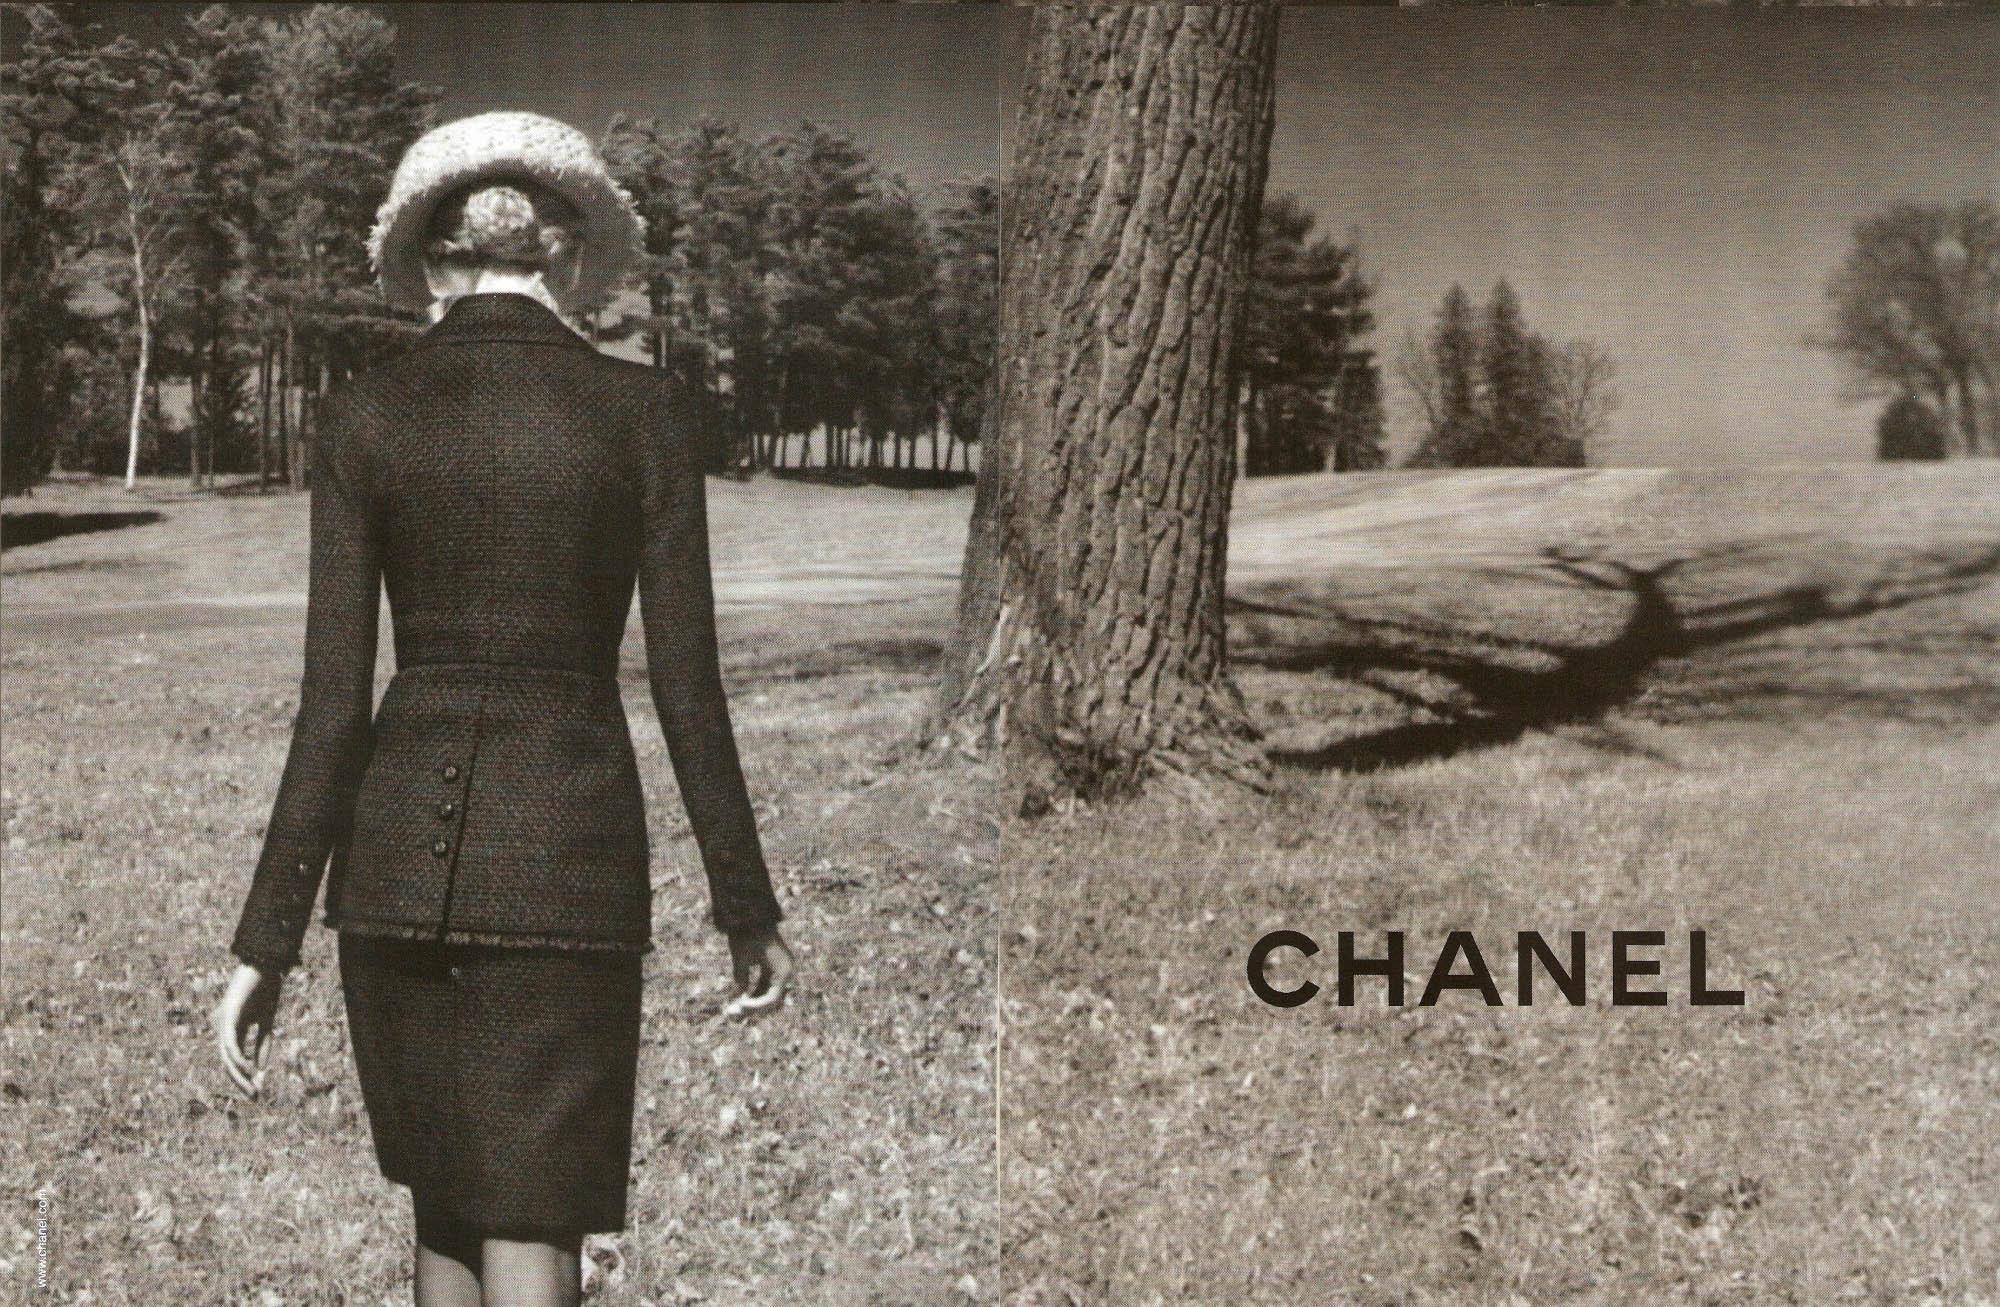 Chanel wallpapers wallpaper cave - Coco chanel desktop wallpaper ...